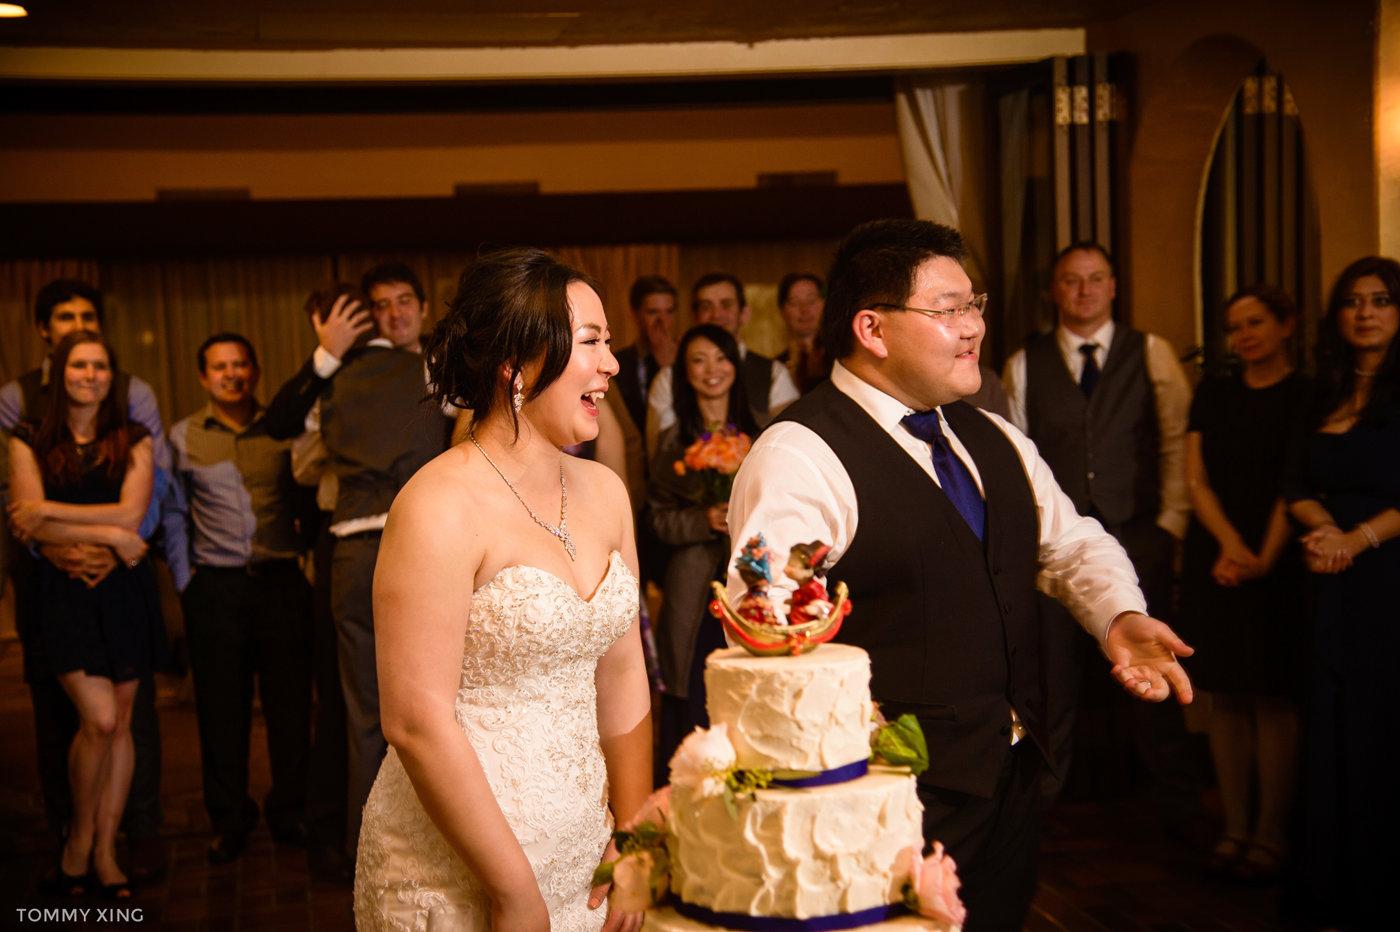 STANFORD MEMORIAL CHURCH WEDDING - Wenjie & Chengcheng - SAN FRANCISCO BAY AREA 斯坦福教堂婚礼跟拍 - 洛杉矶婚礼婚纱照摄影师 Tommy Xing Photography242.jpg